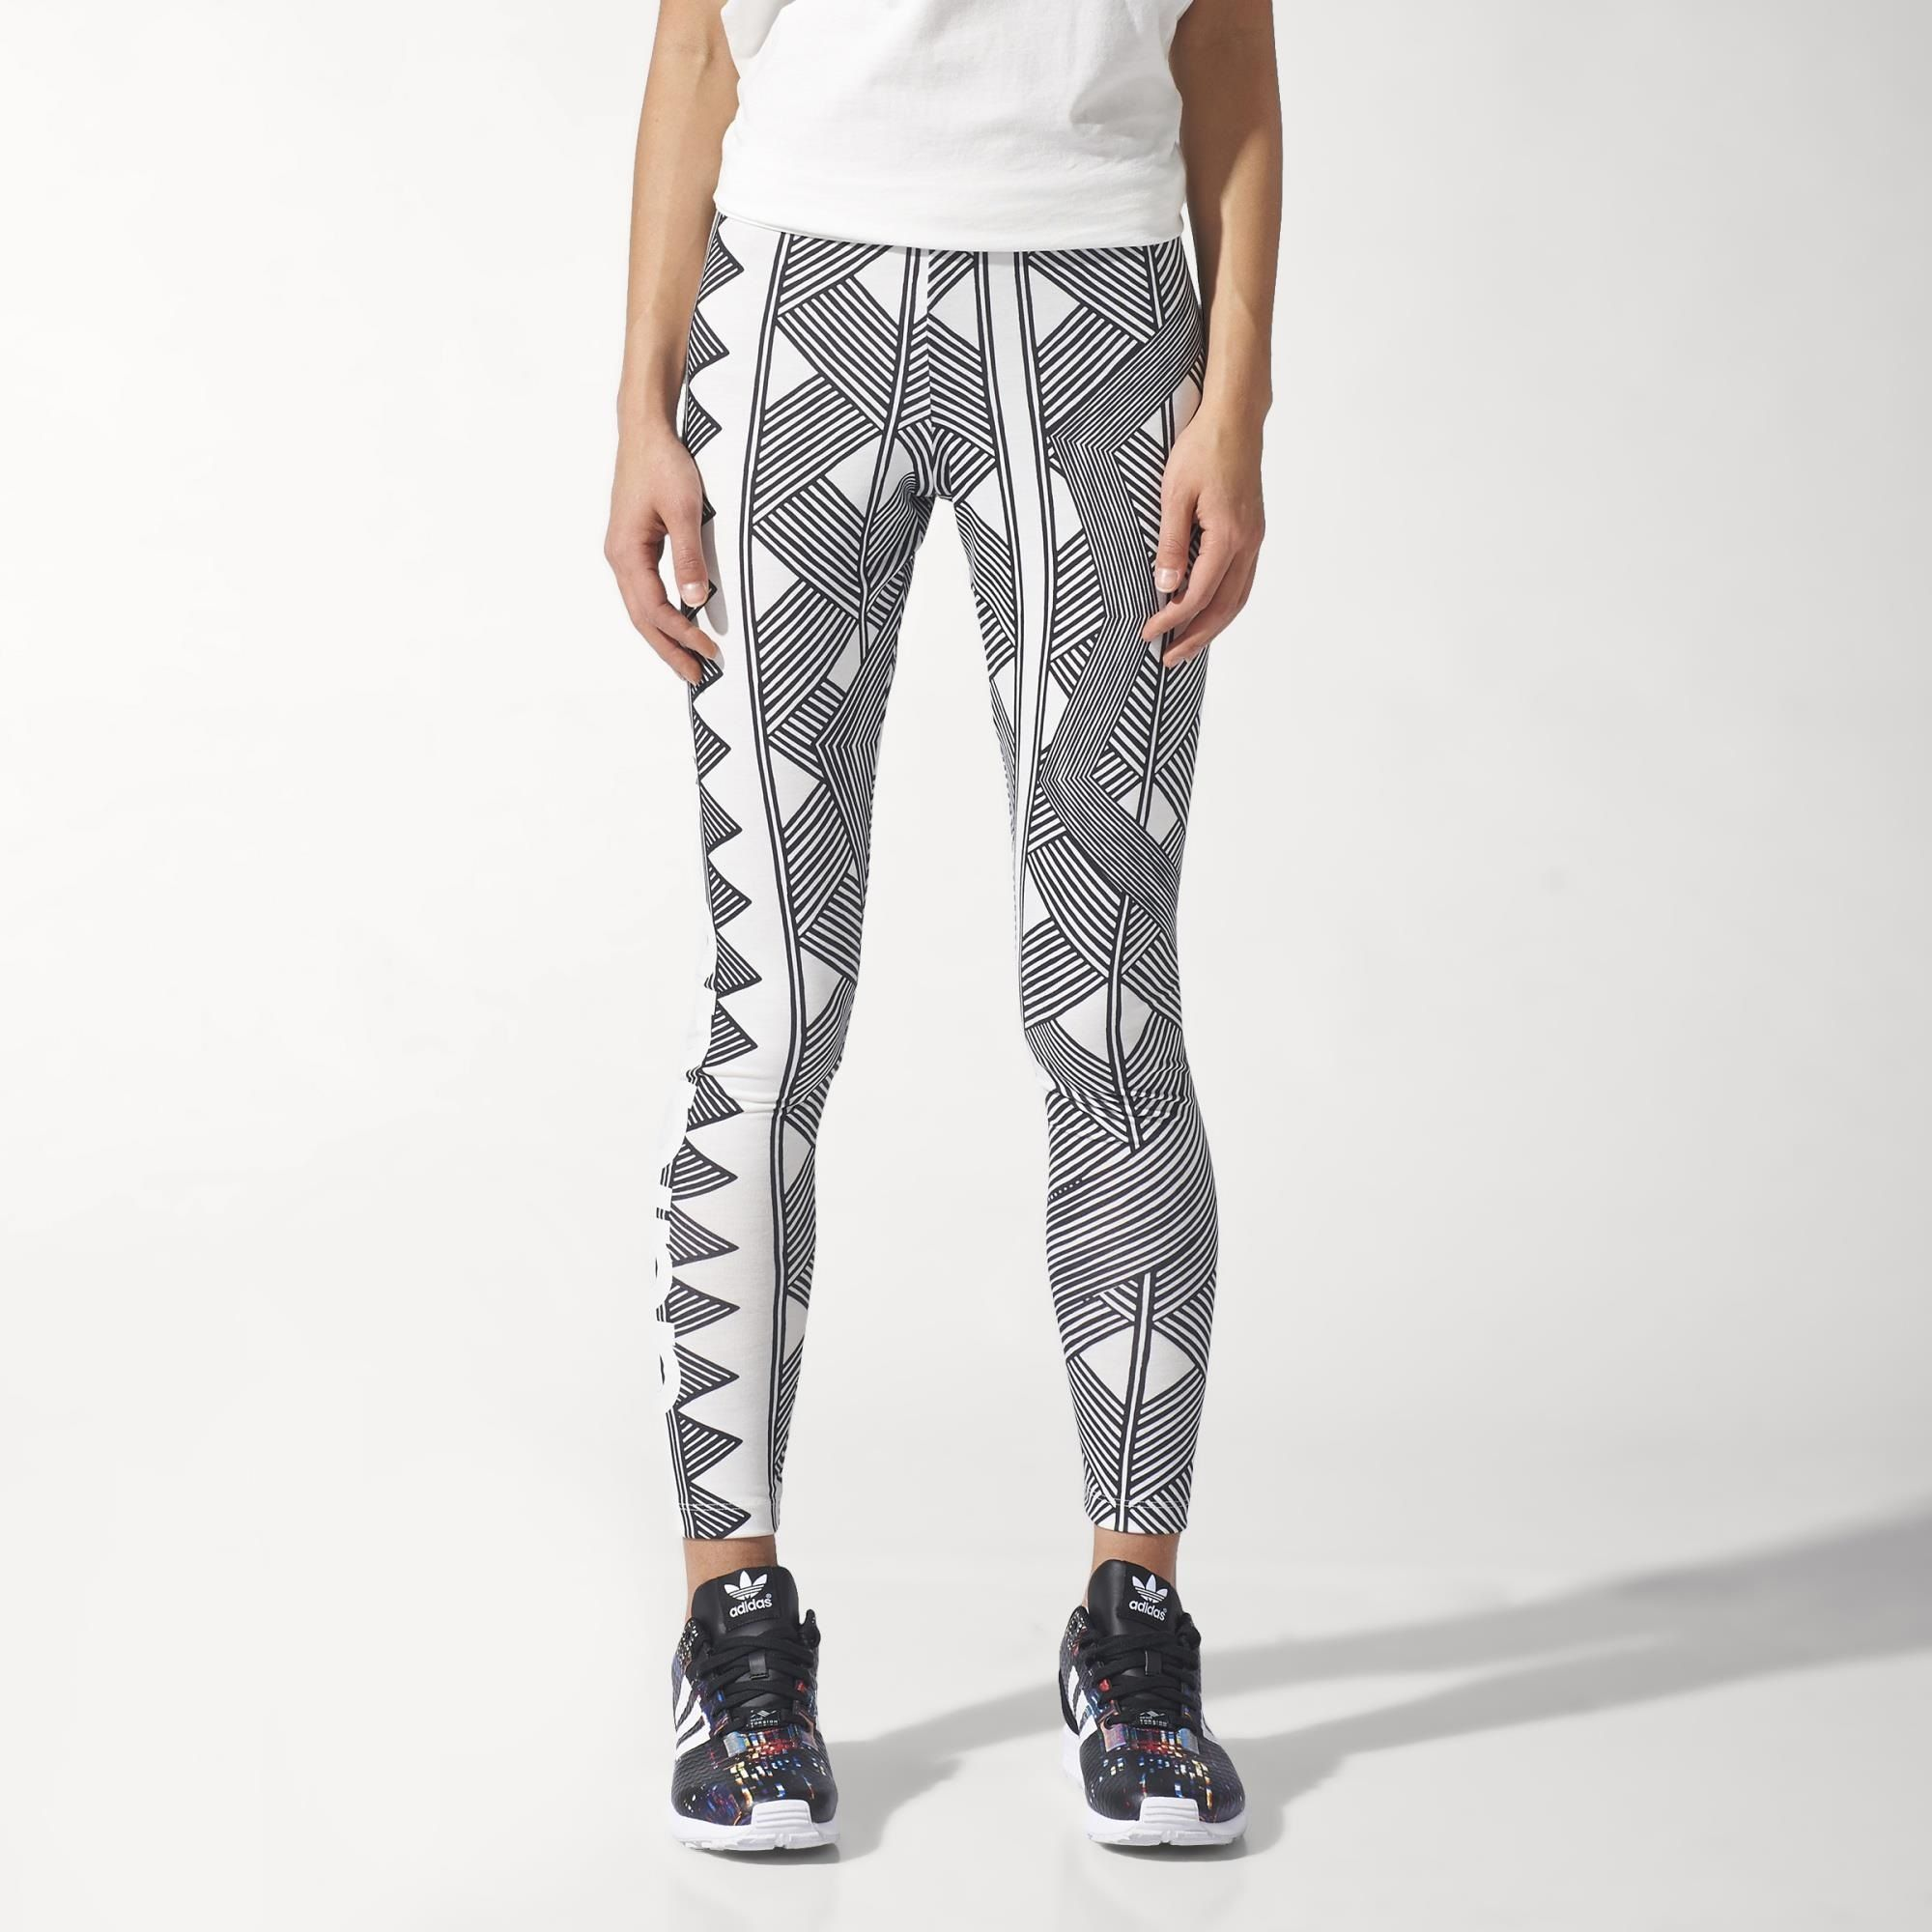 adidas leggings sale womens